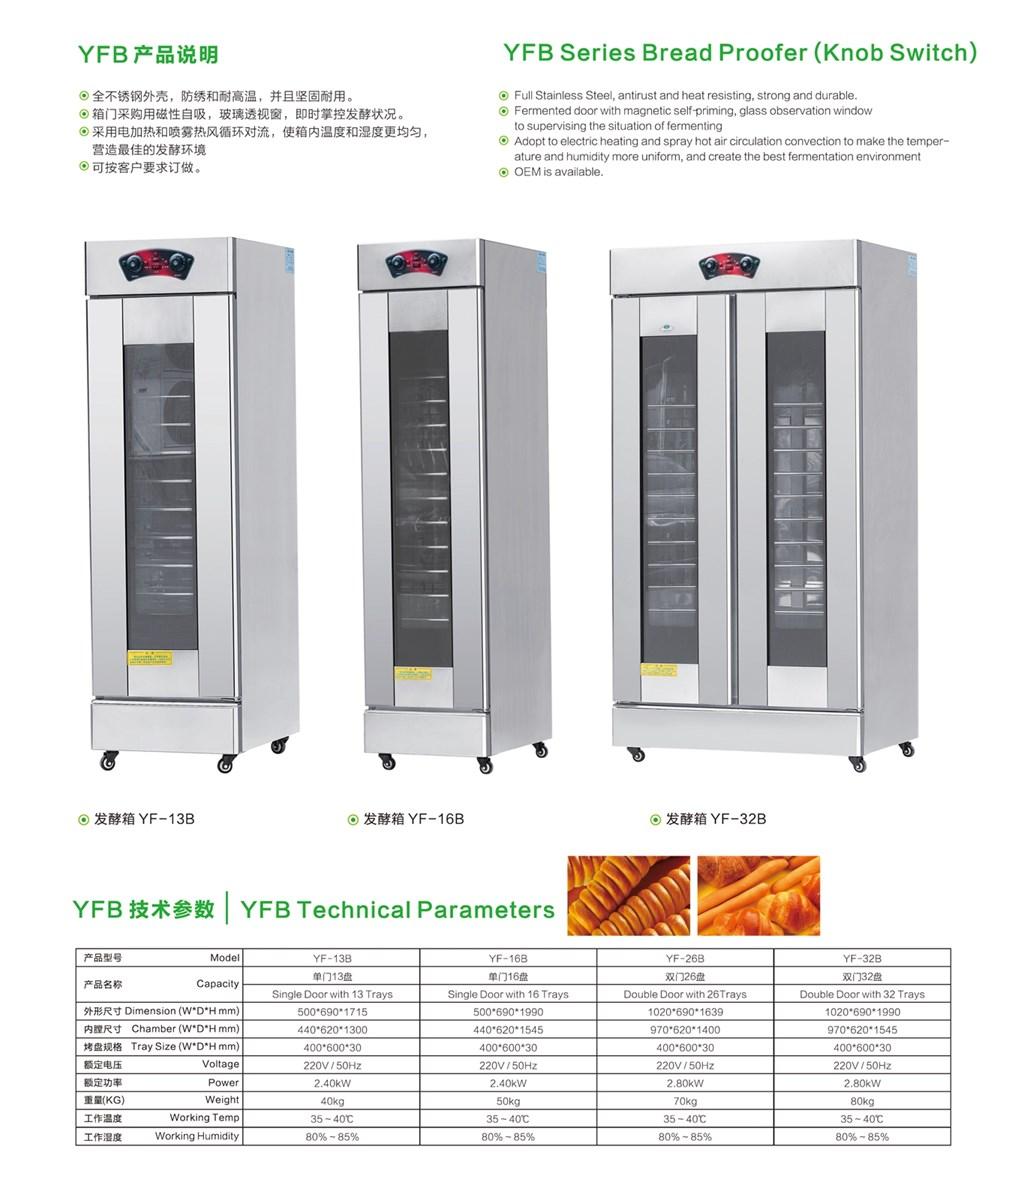 Knob Switch type Bread Proofer YF32B